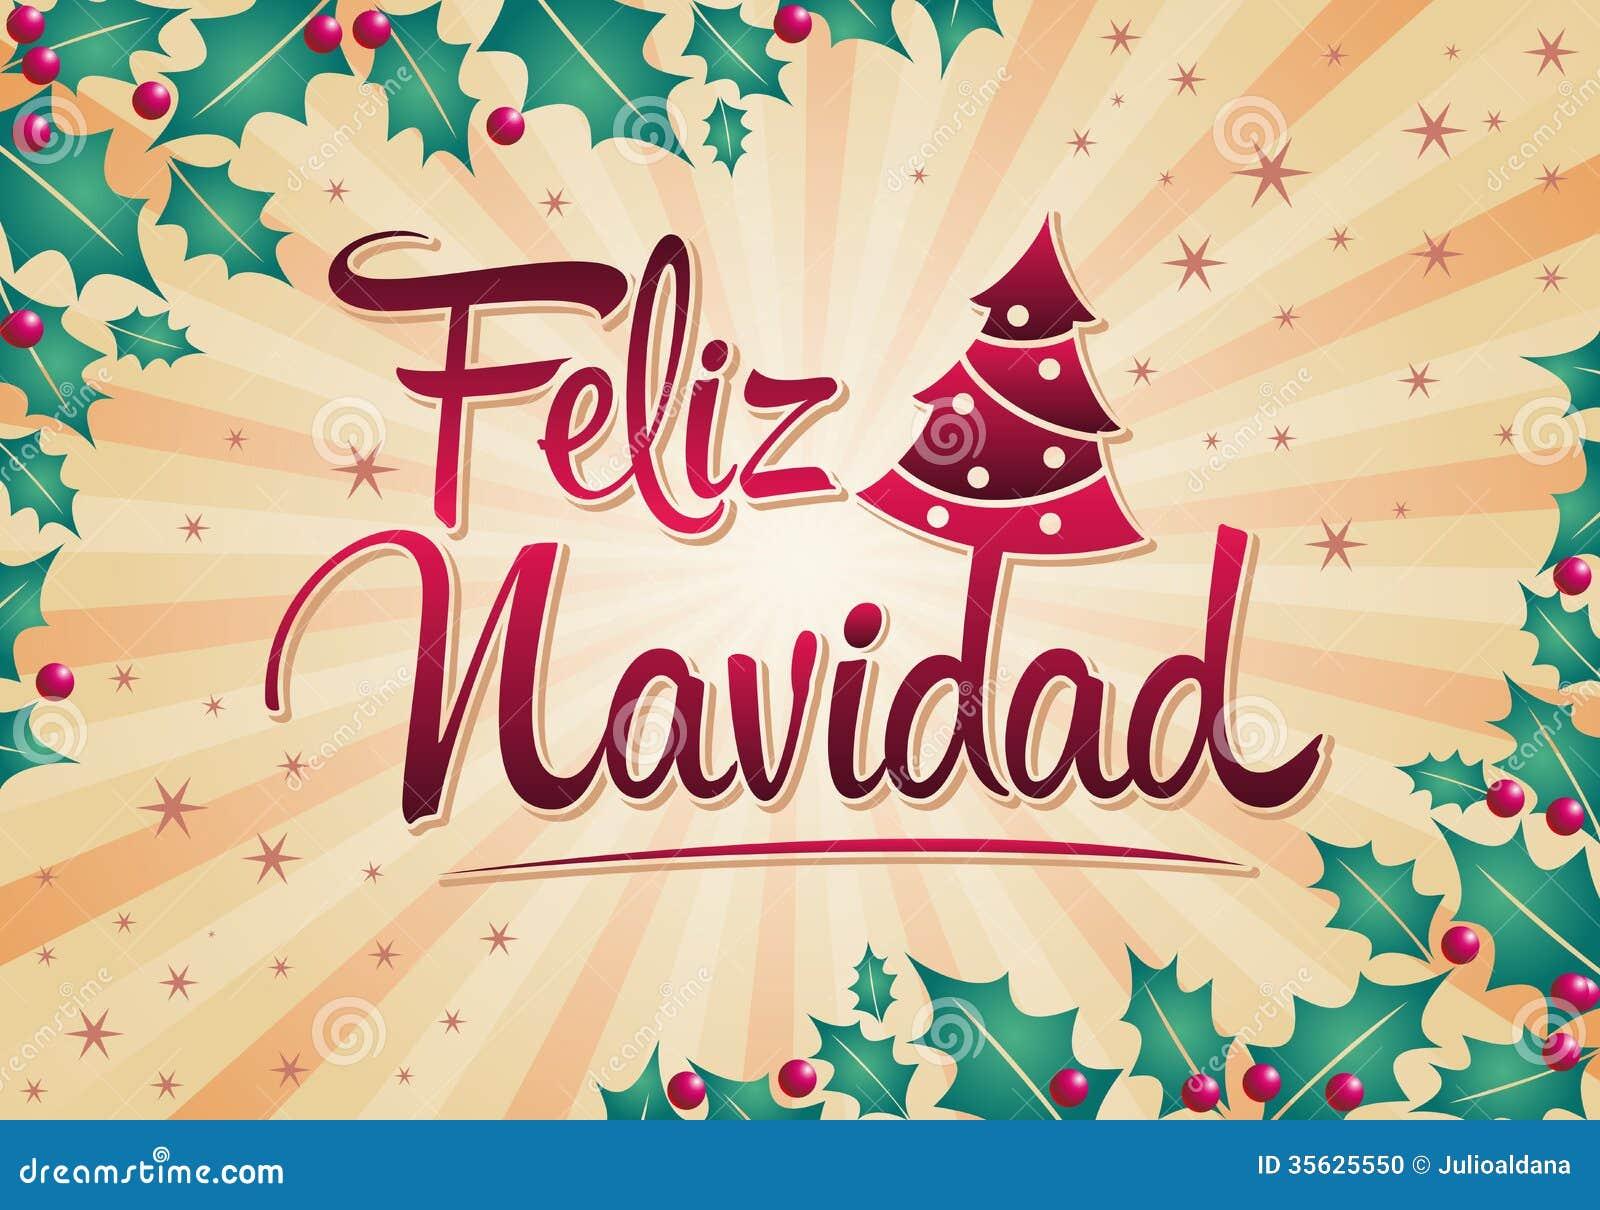 Feliz navidad stock photo image of happy calligraphic 35625550 feliz navidad kristyandbryce Images